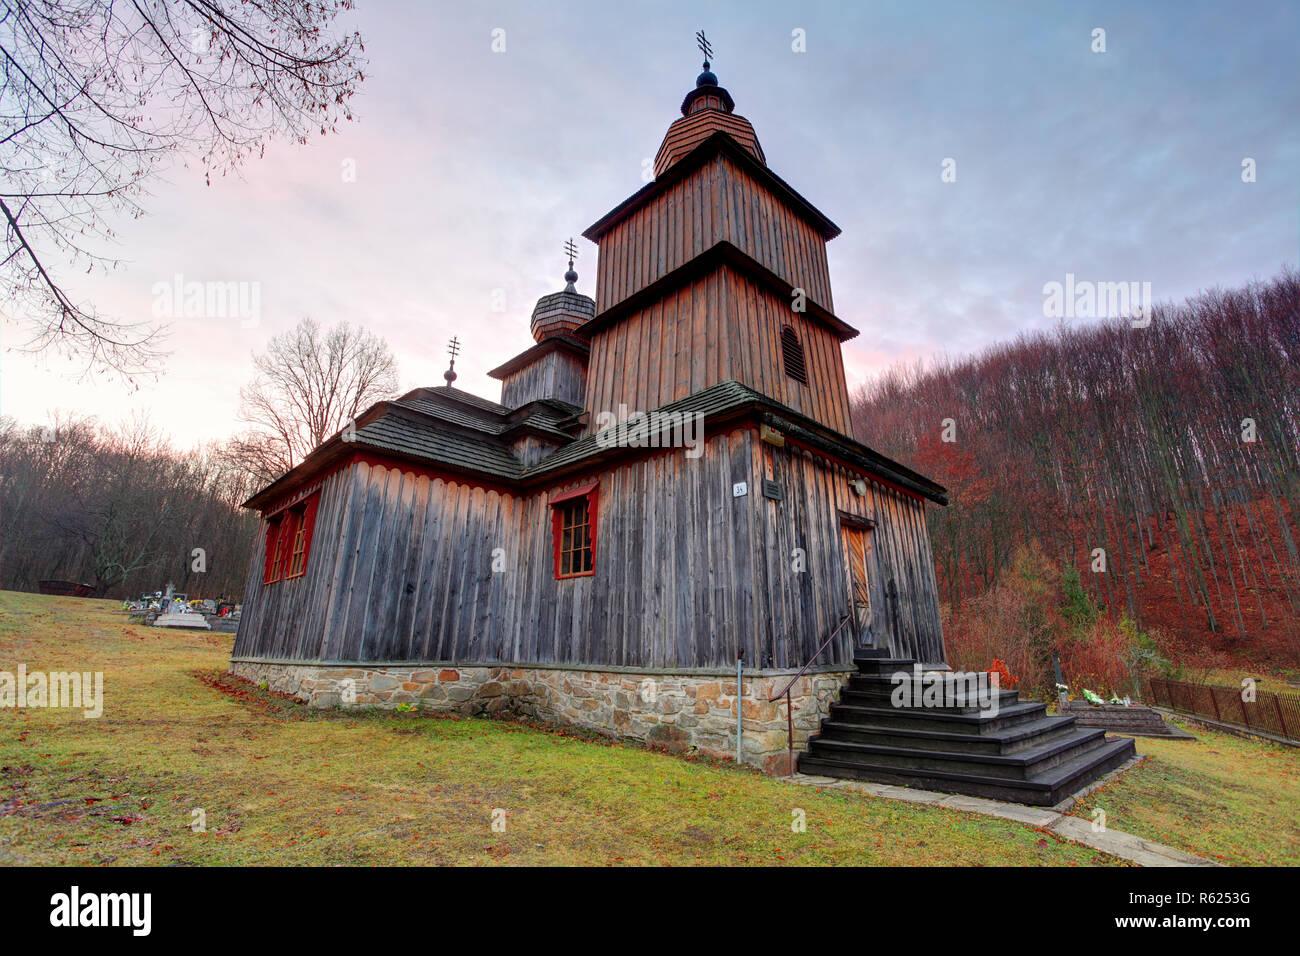 Wooden Church Slovakia Architecture Stock Photos Wooden Church